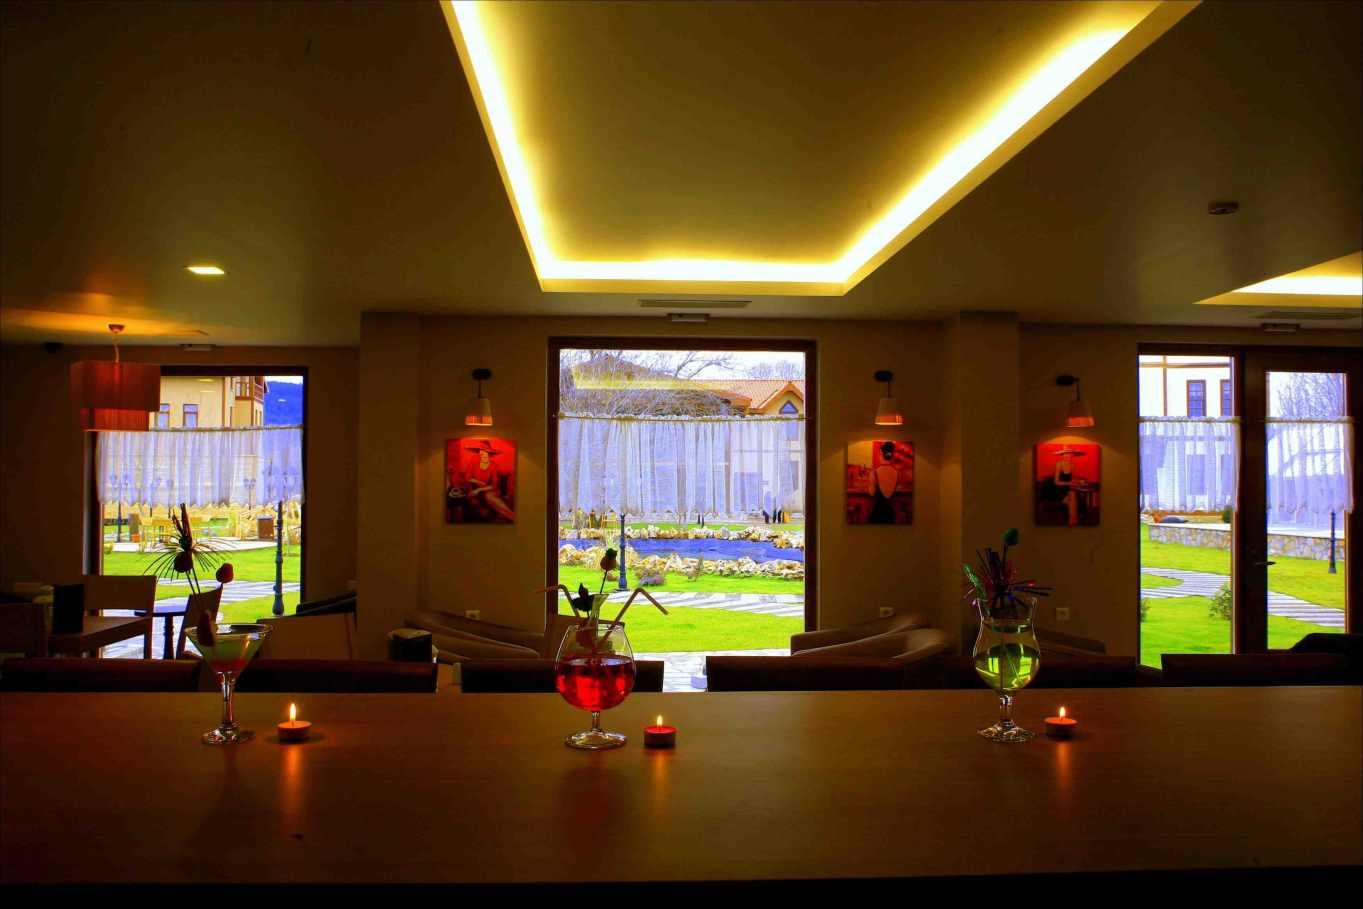 İksir Resort Town Restorant